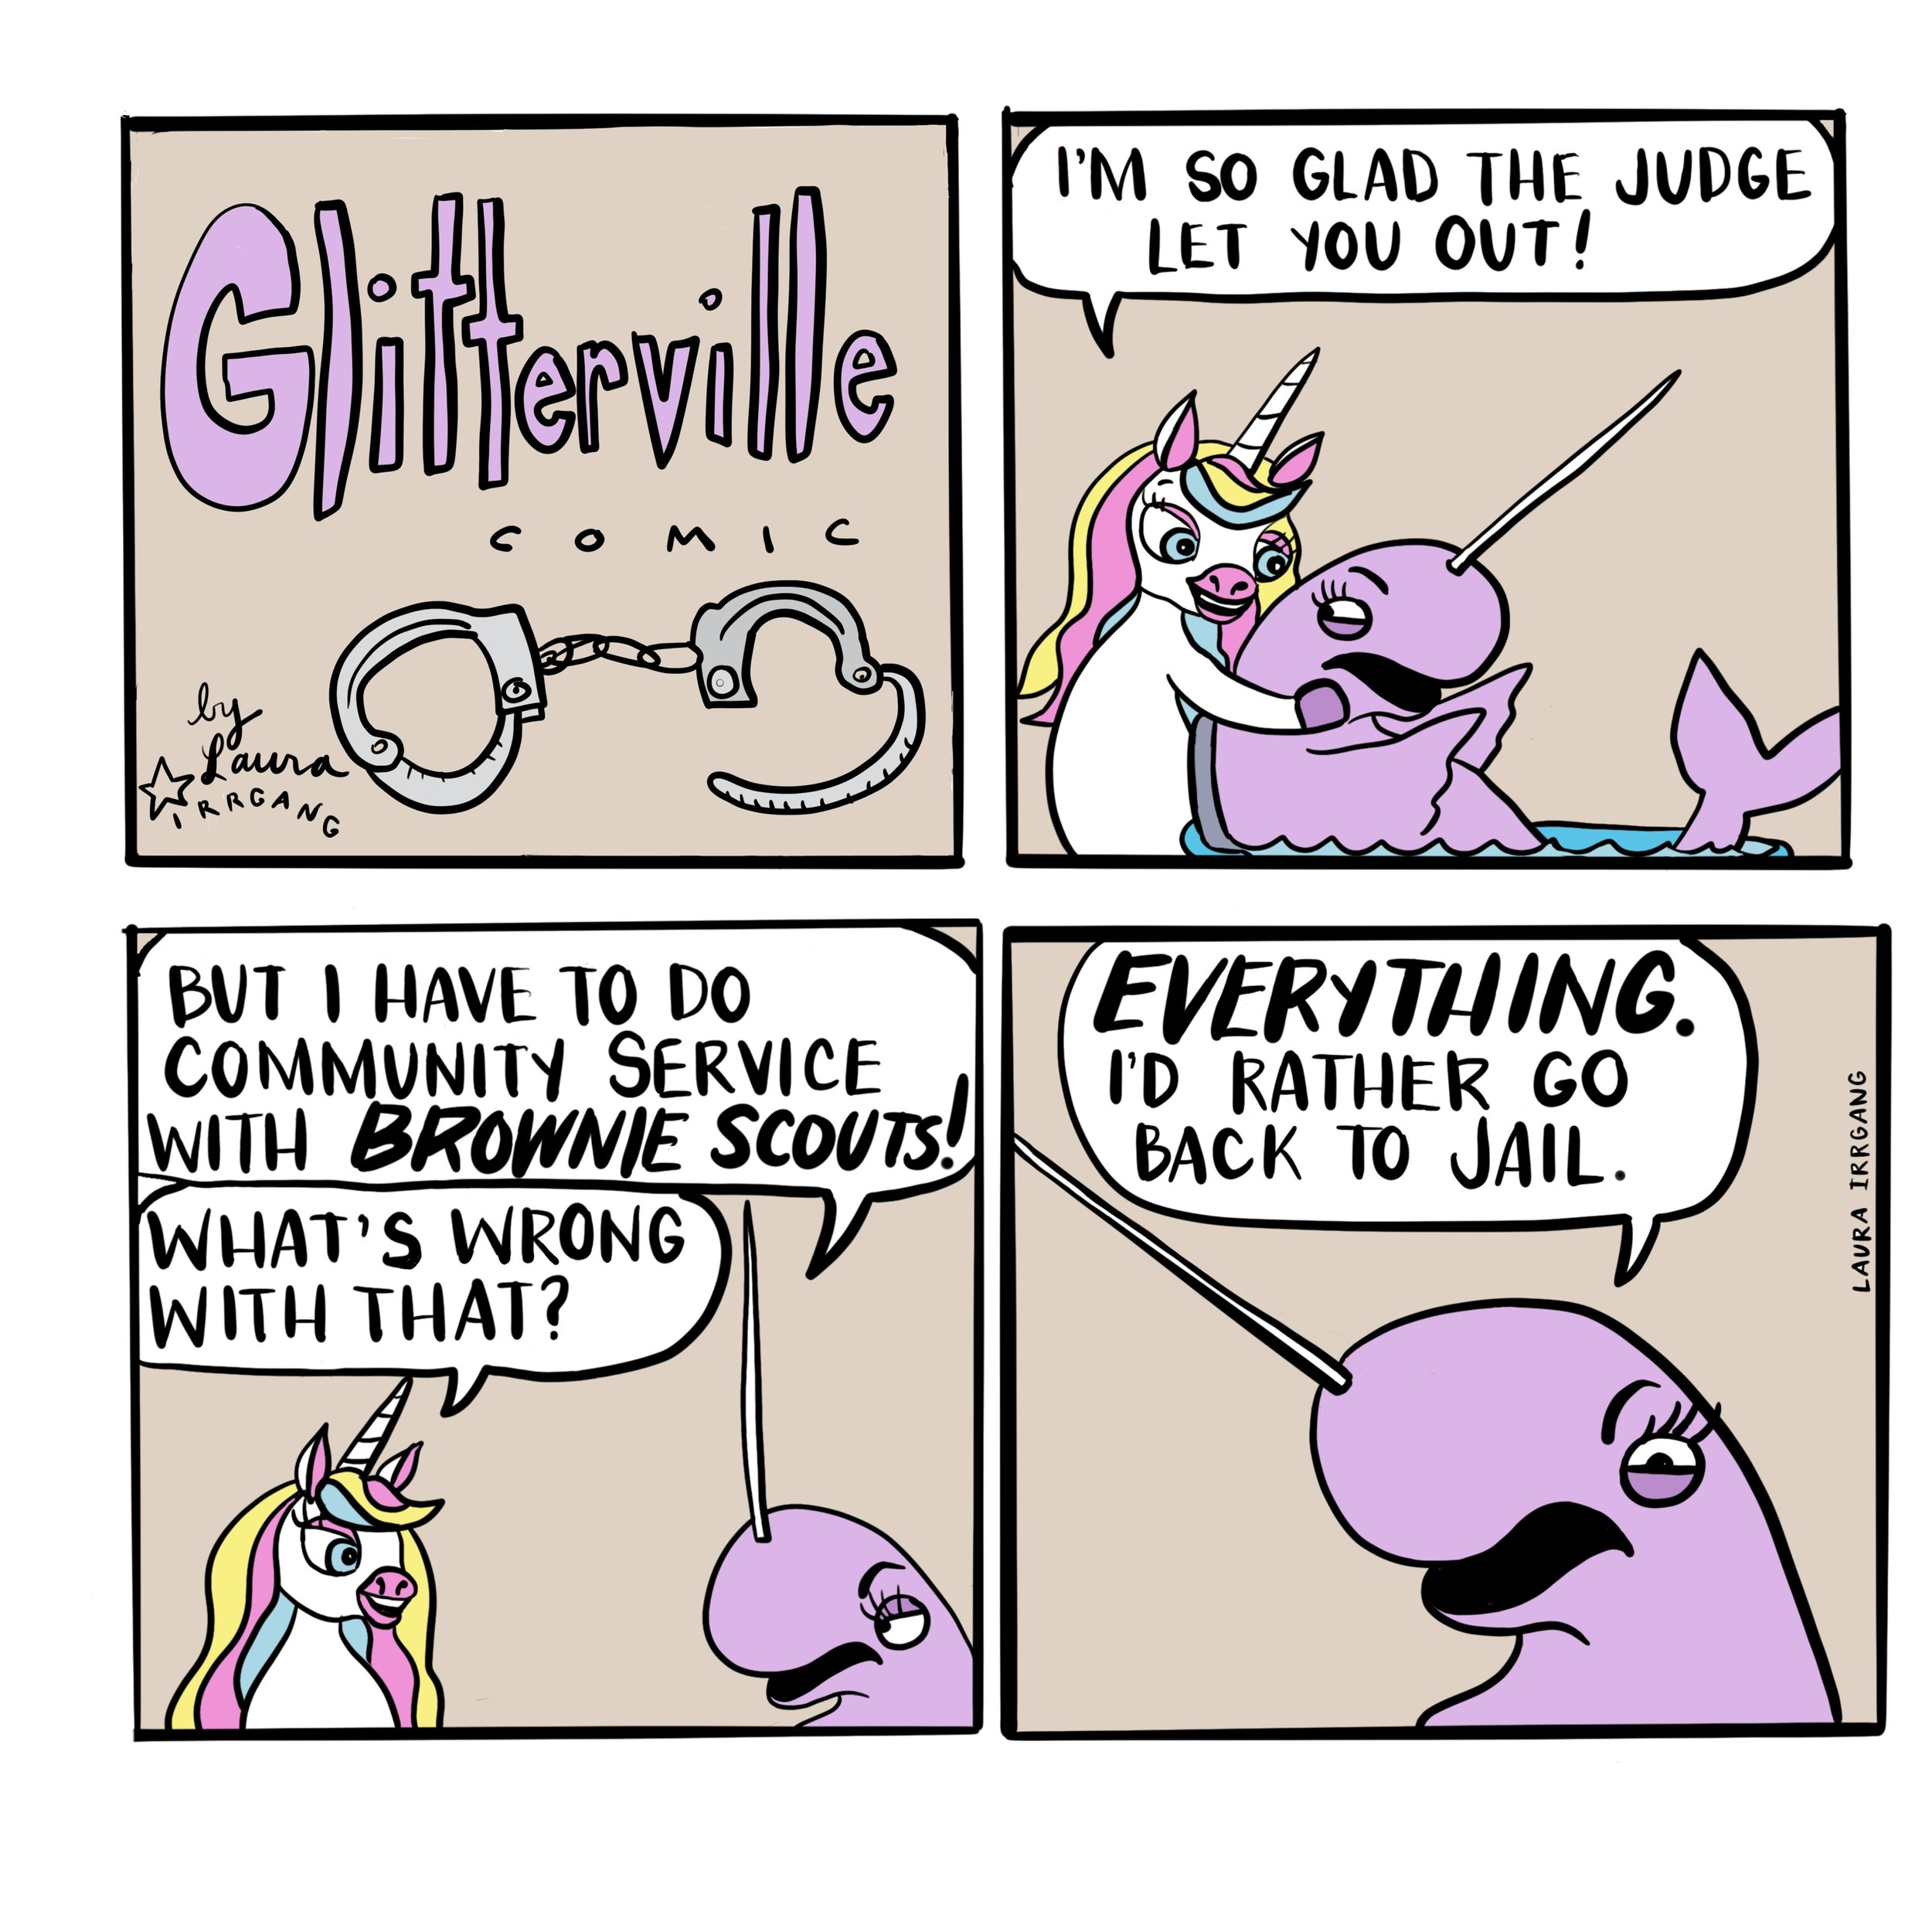 Glitterville Comic-January 21, 2019  (1).jpg